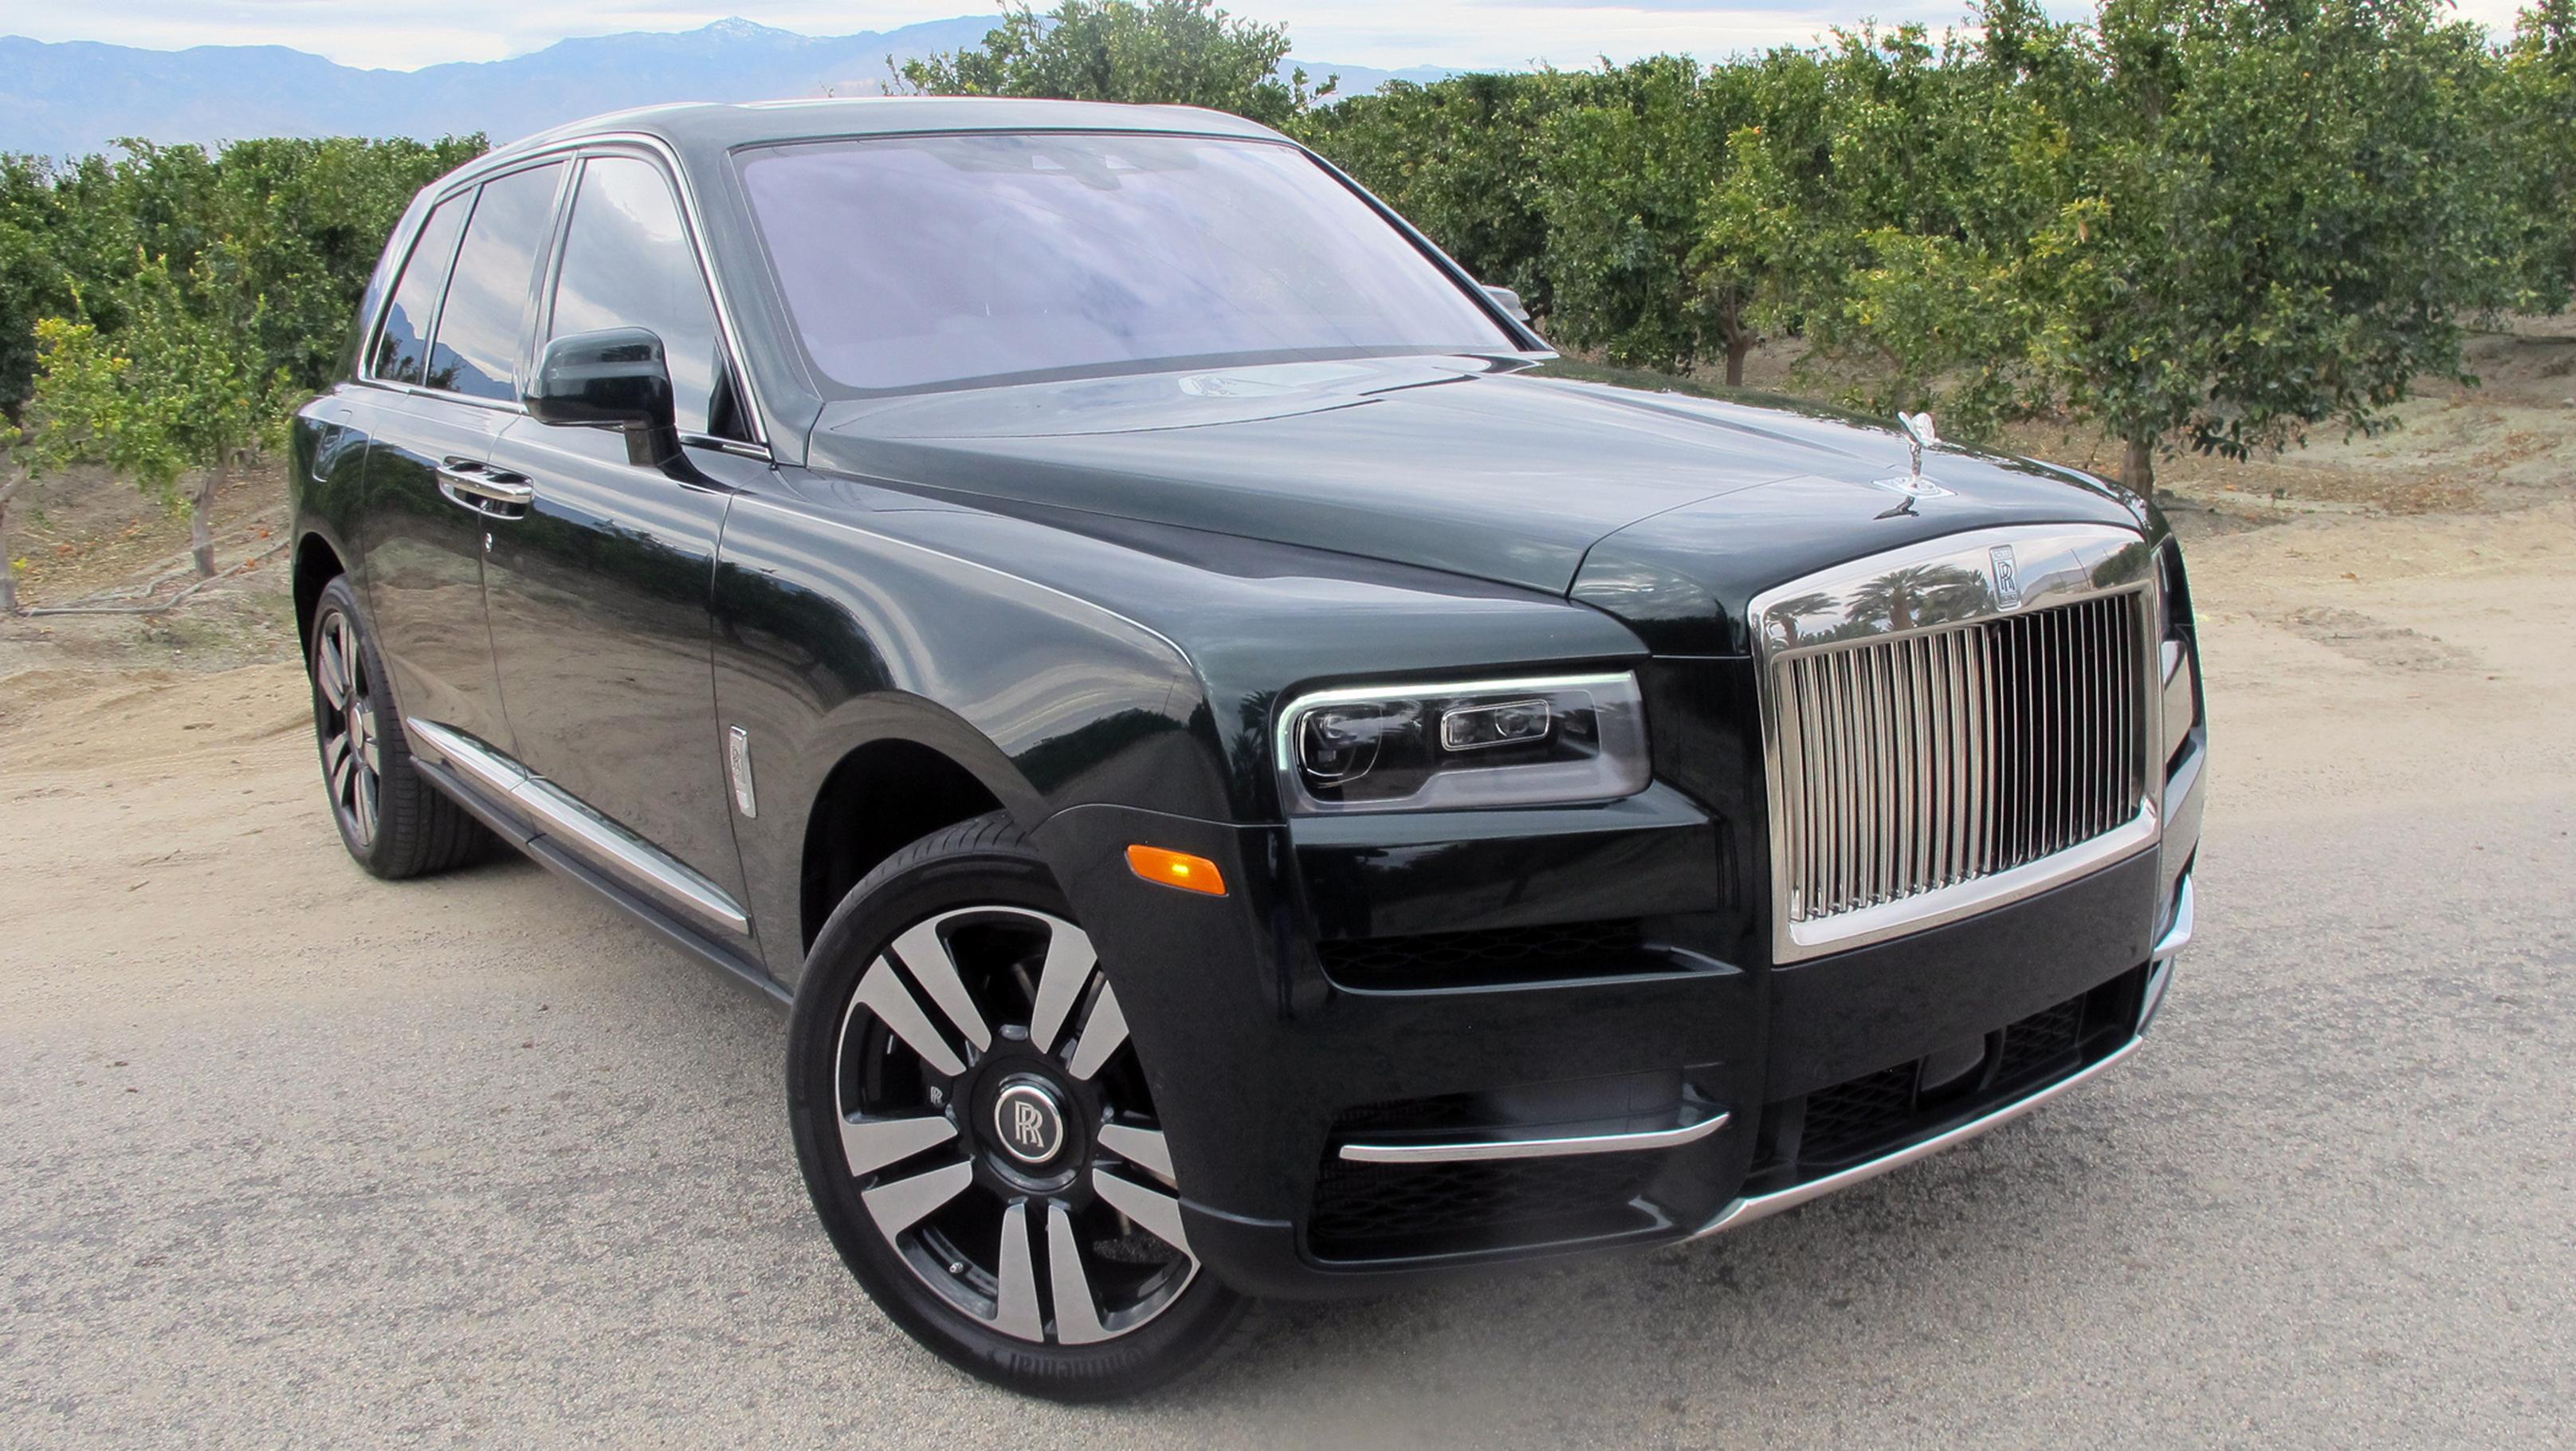 First Drive 2019 Rolls-Royce Cullinan